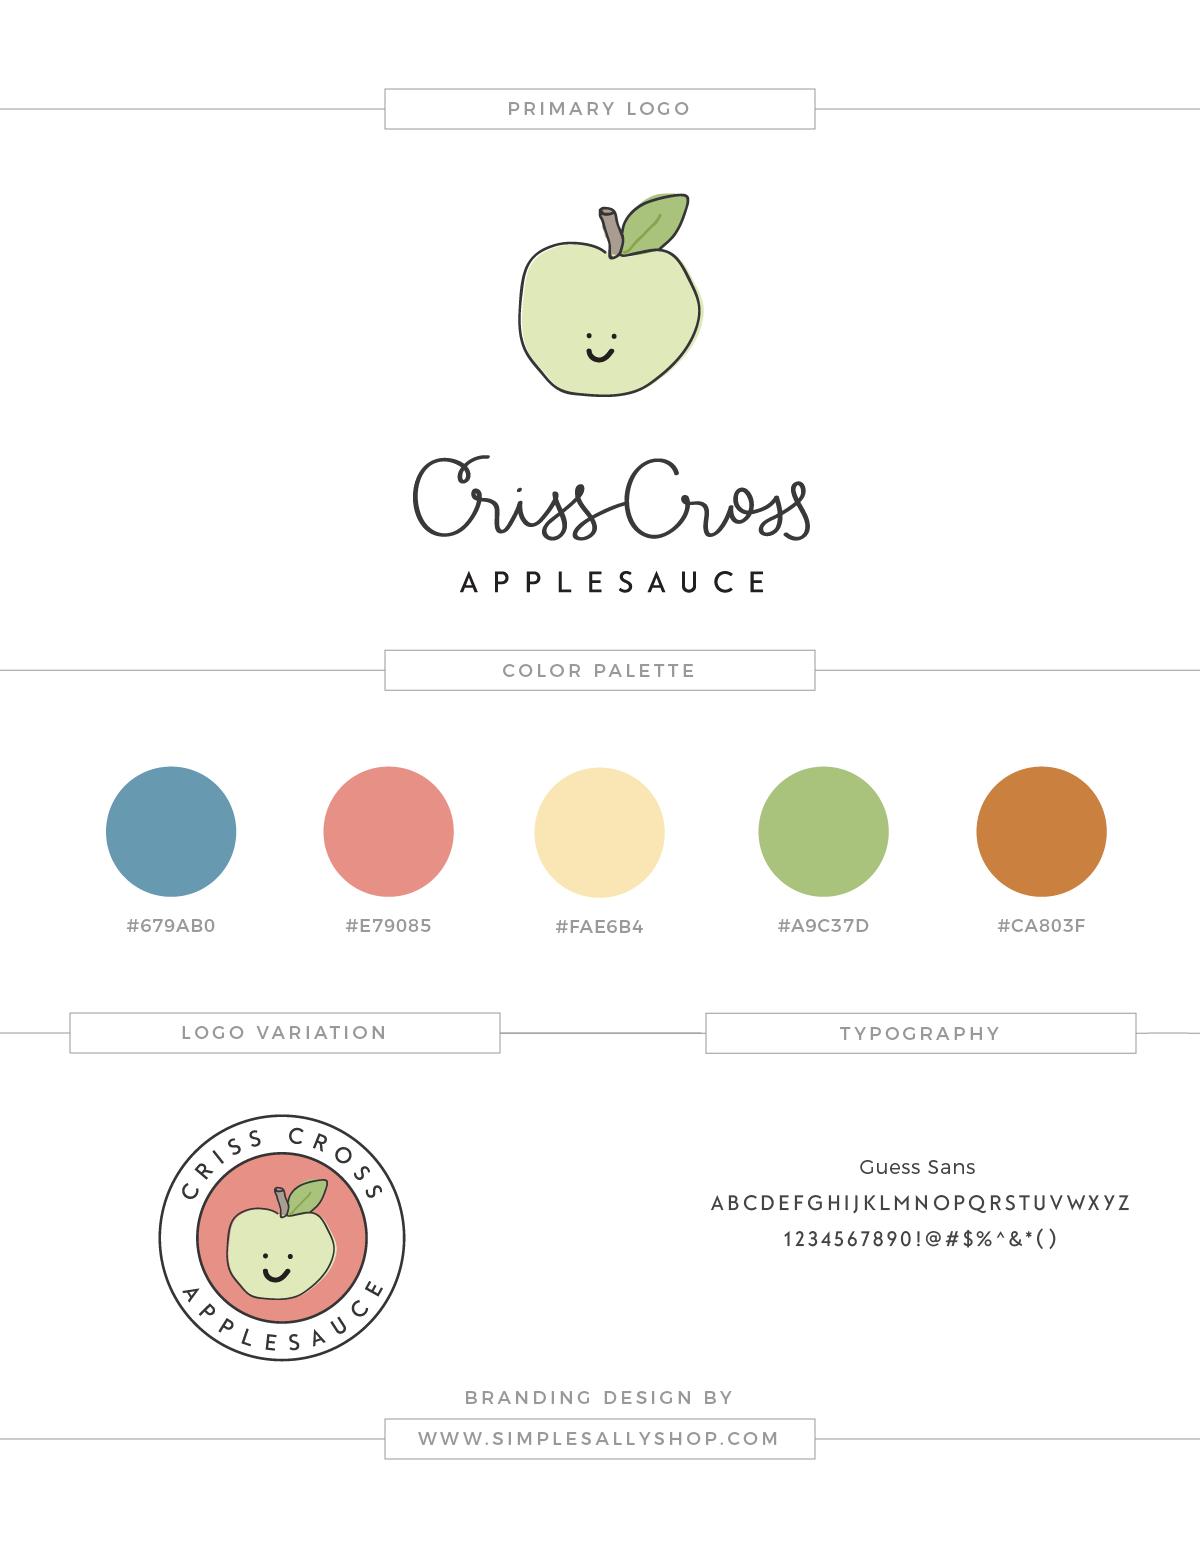 Criss Cross Applesauce Logo Design by Simple Sally | #logo #simple #simplelogo #crisscrossapplesauce